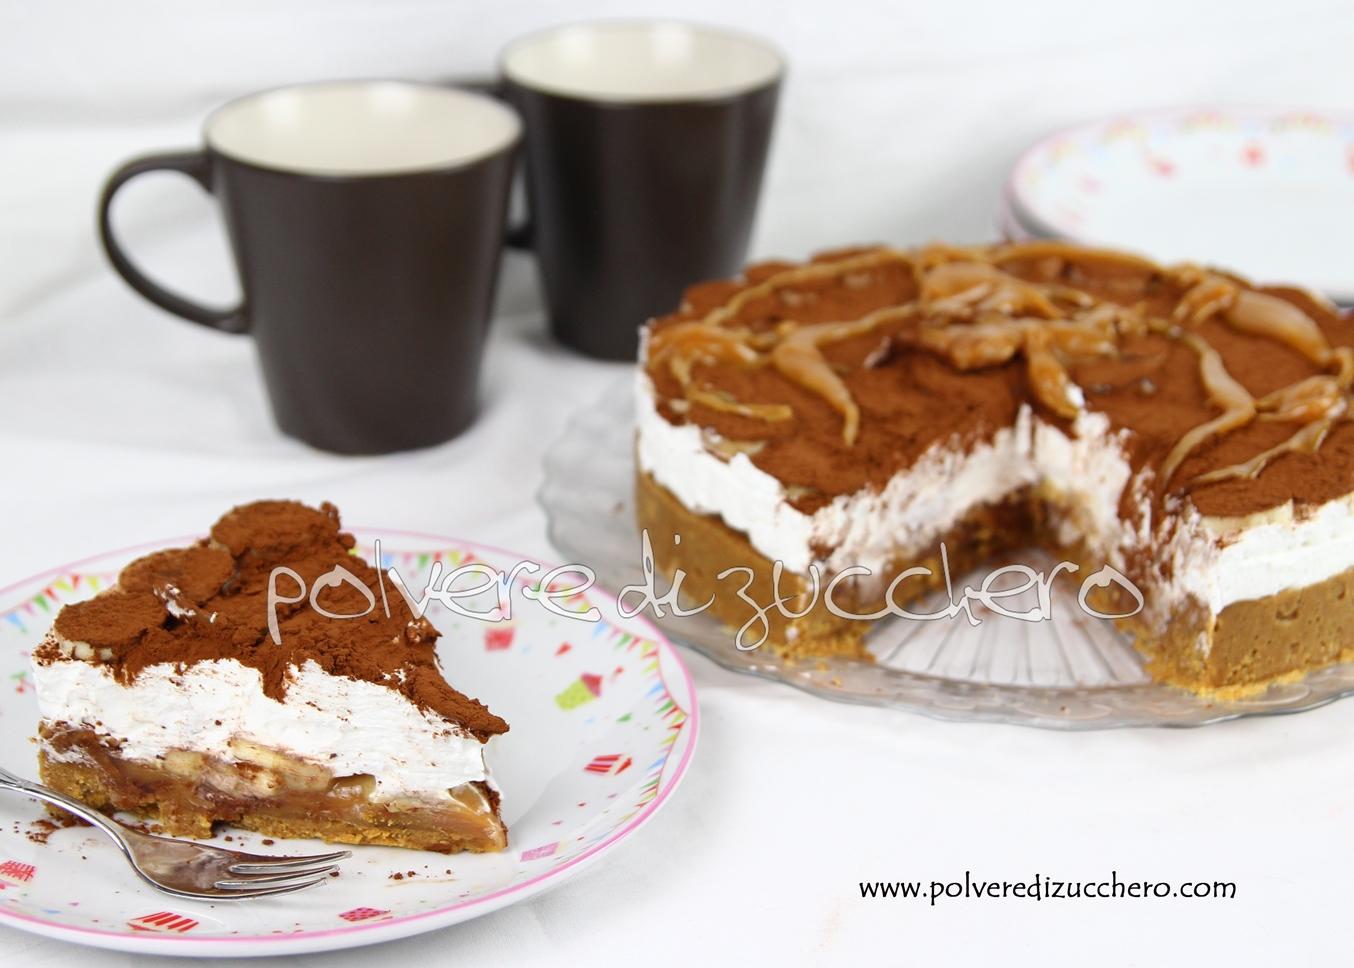 tutorial passo a passo ricette banoffee pie banane cacao caramello recipe toffee polvere di zucchero